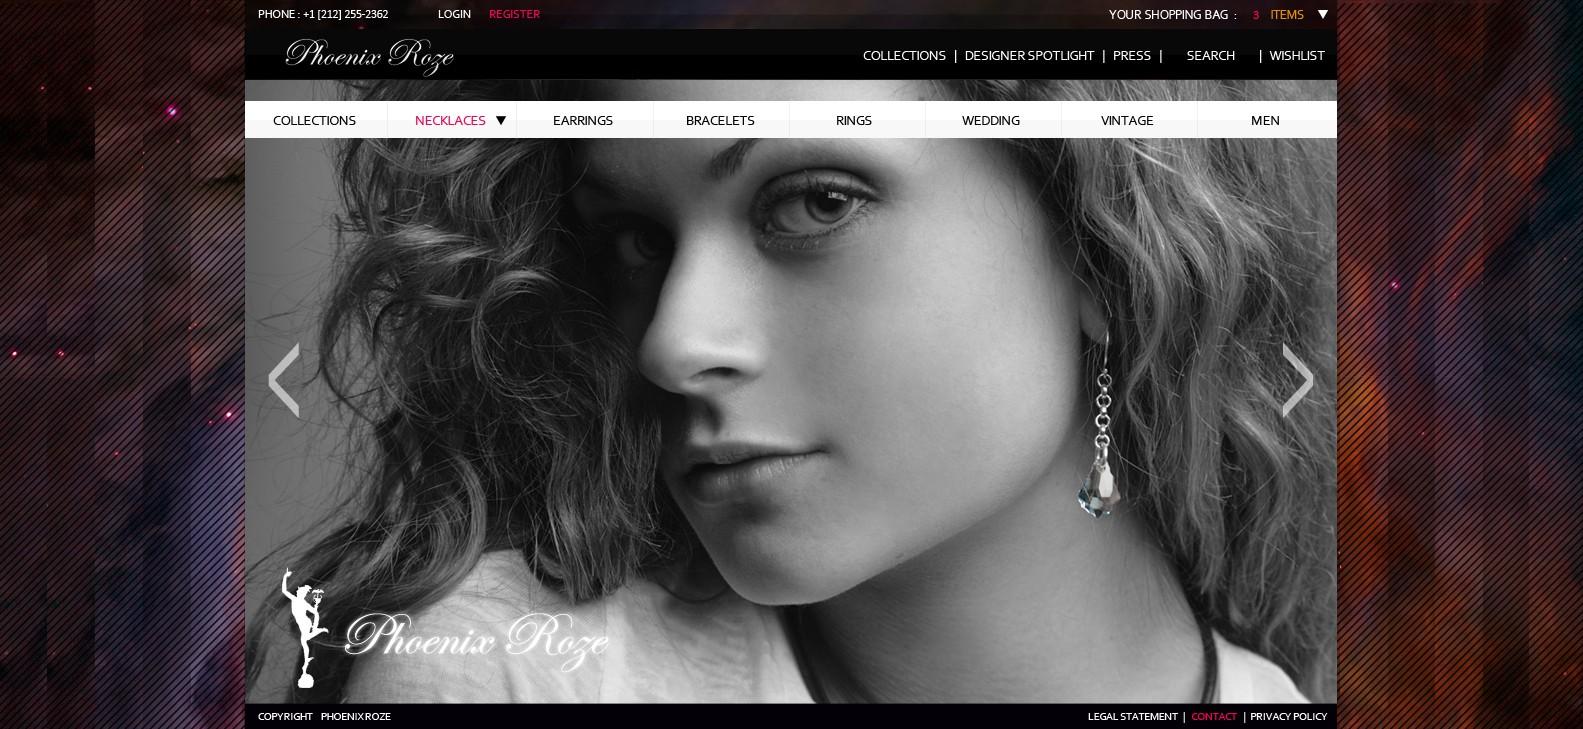 PhoenixRoze needs a new website design